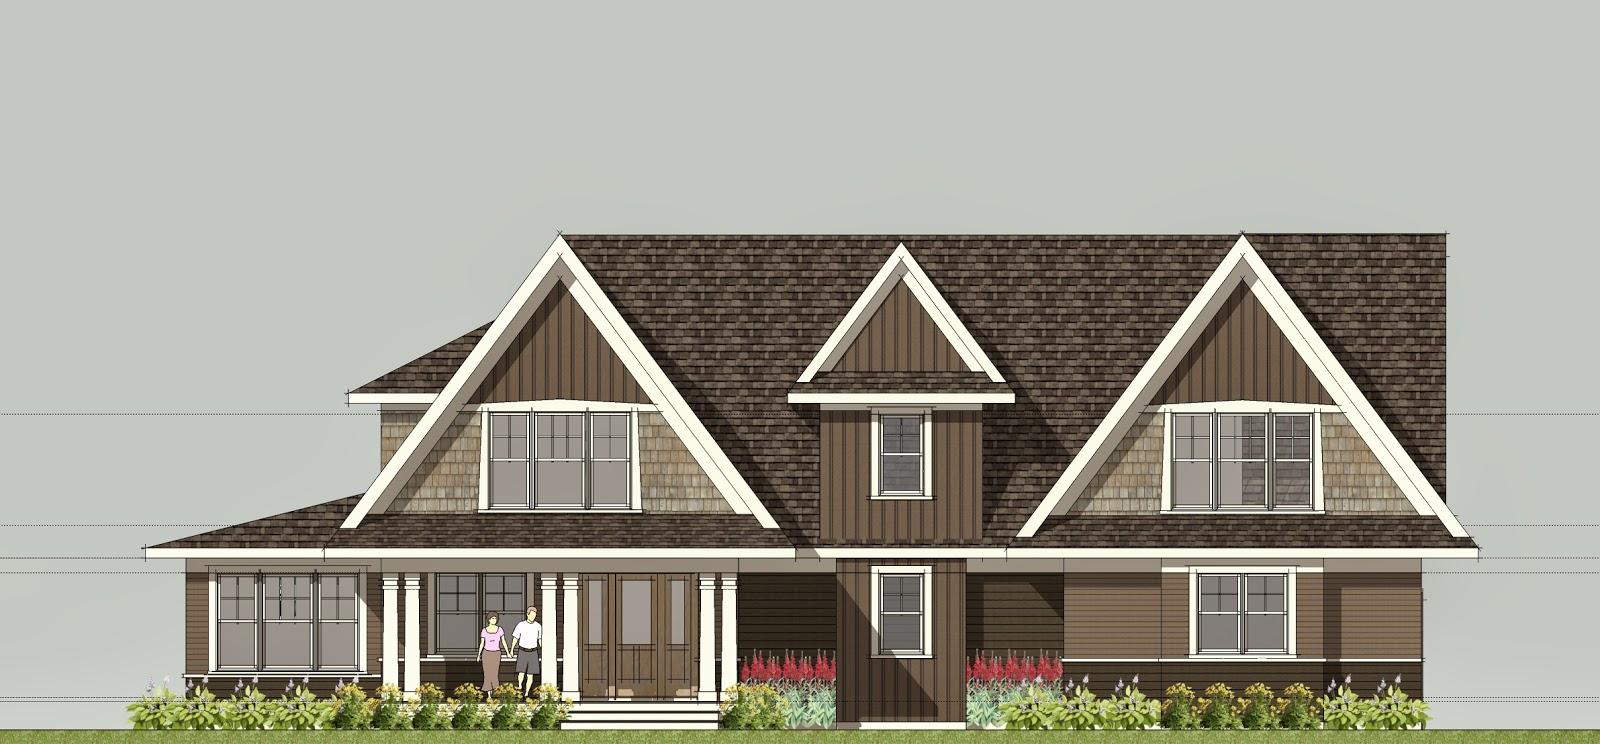 Simply elegant home designs blog home plans from big to Simply elegant house plans